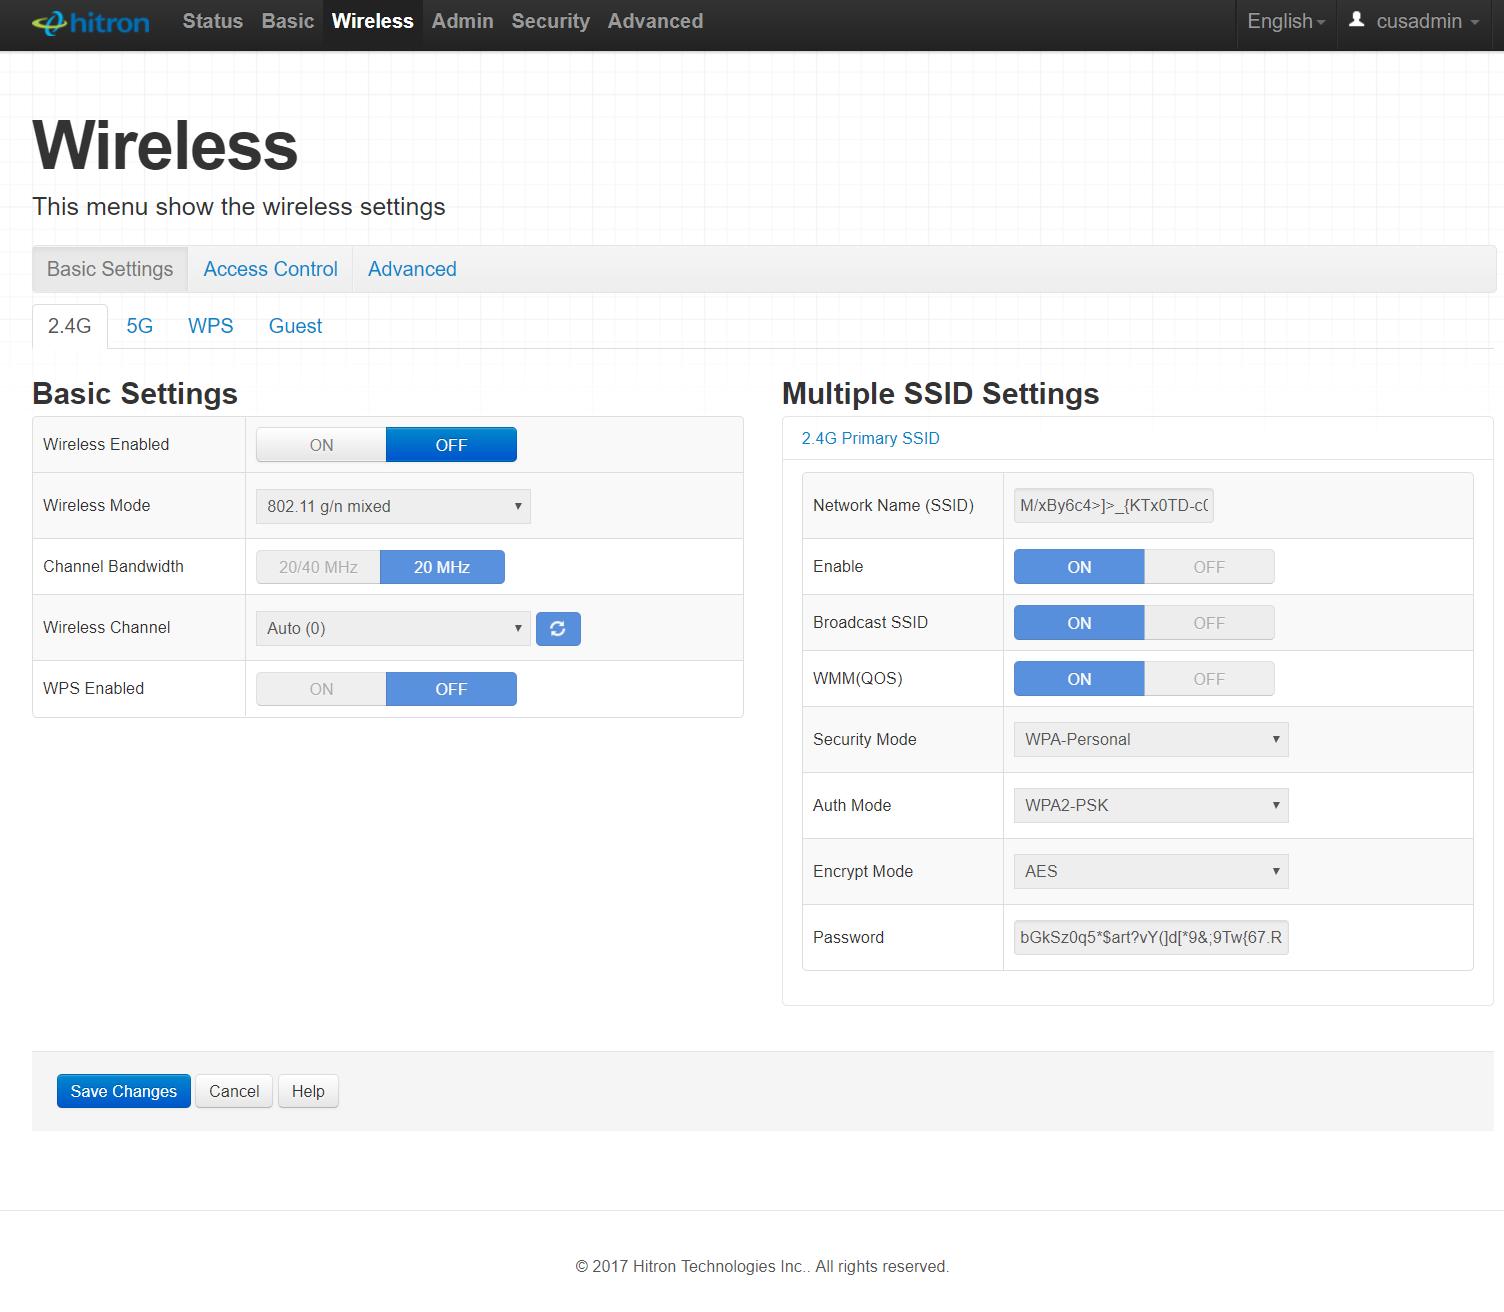 20_WIRELESS_Basic Settings 2.4G.png